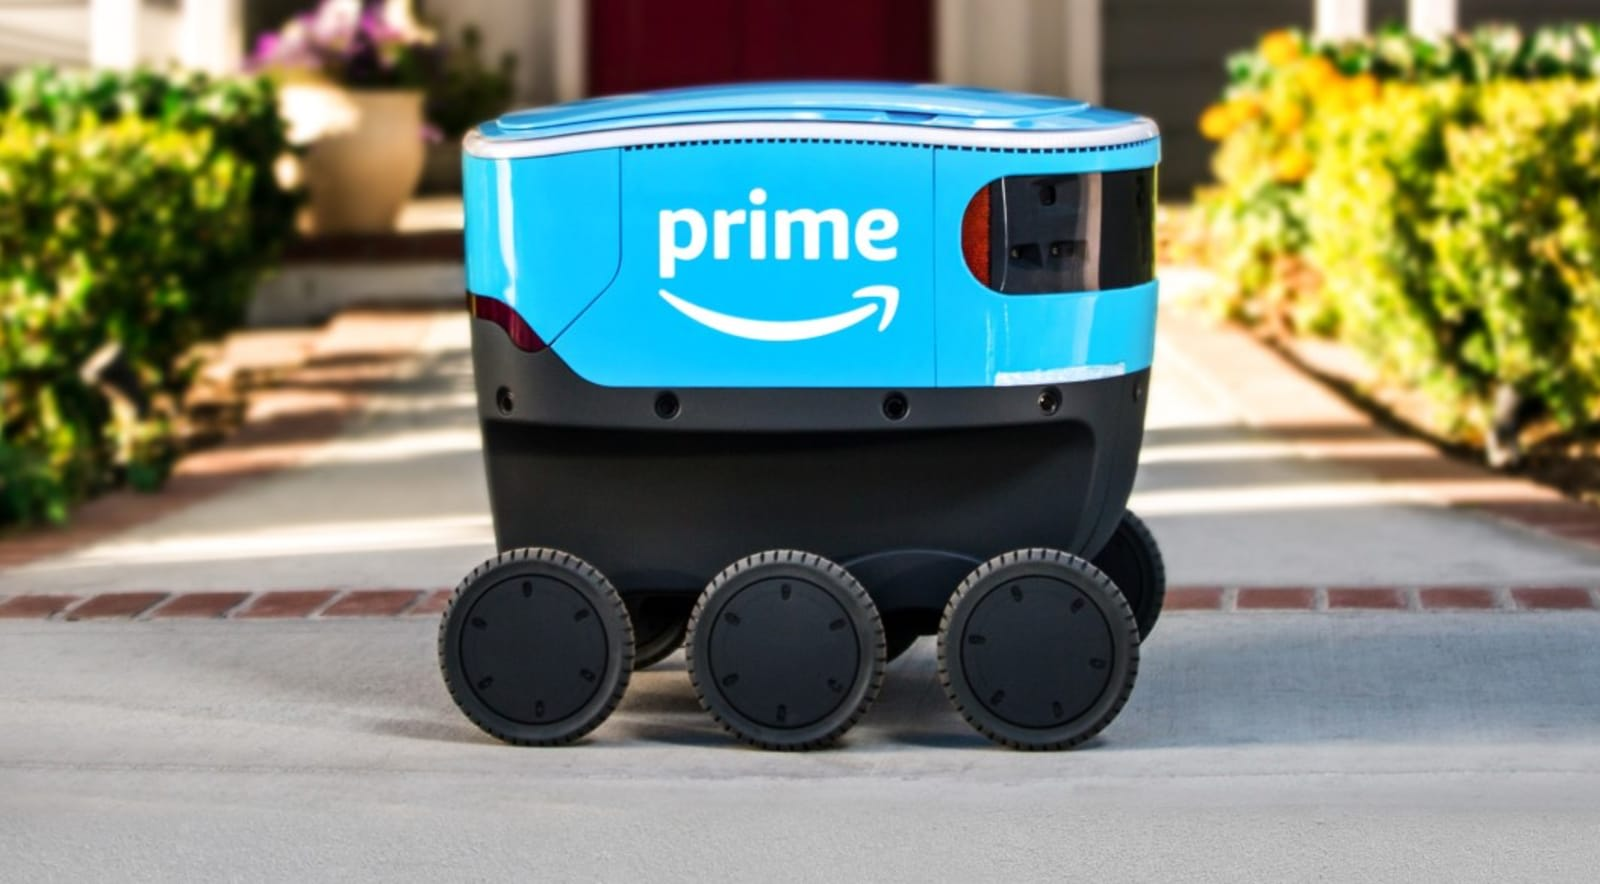 Hasil gambar untuk Robot Scout Amazon